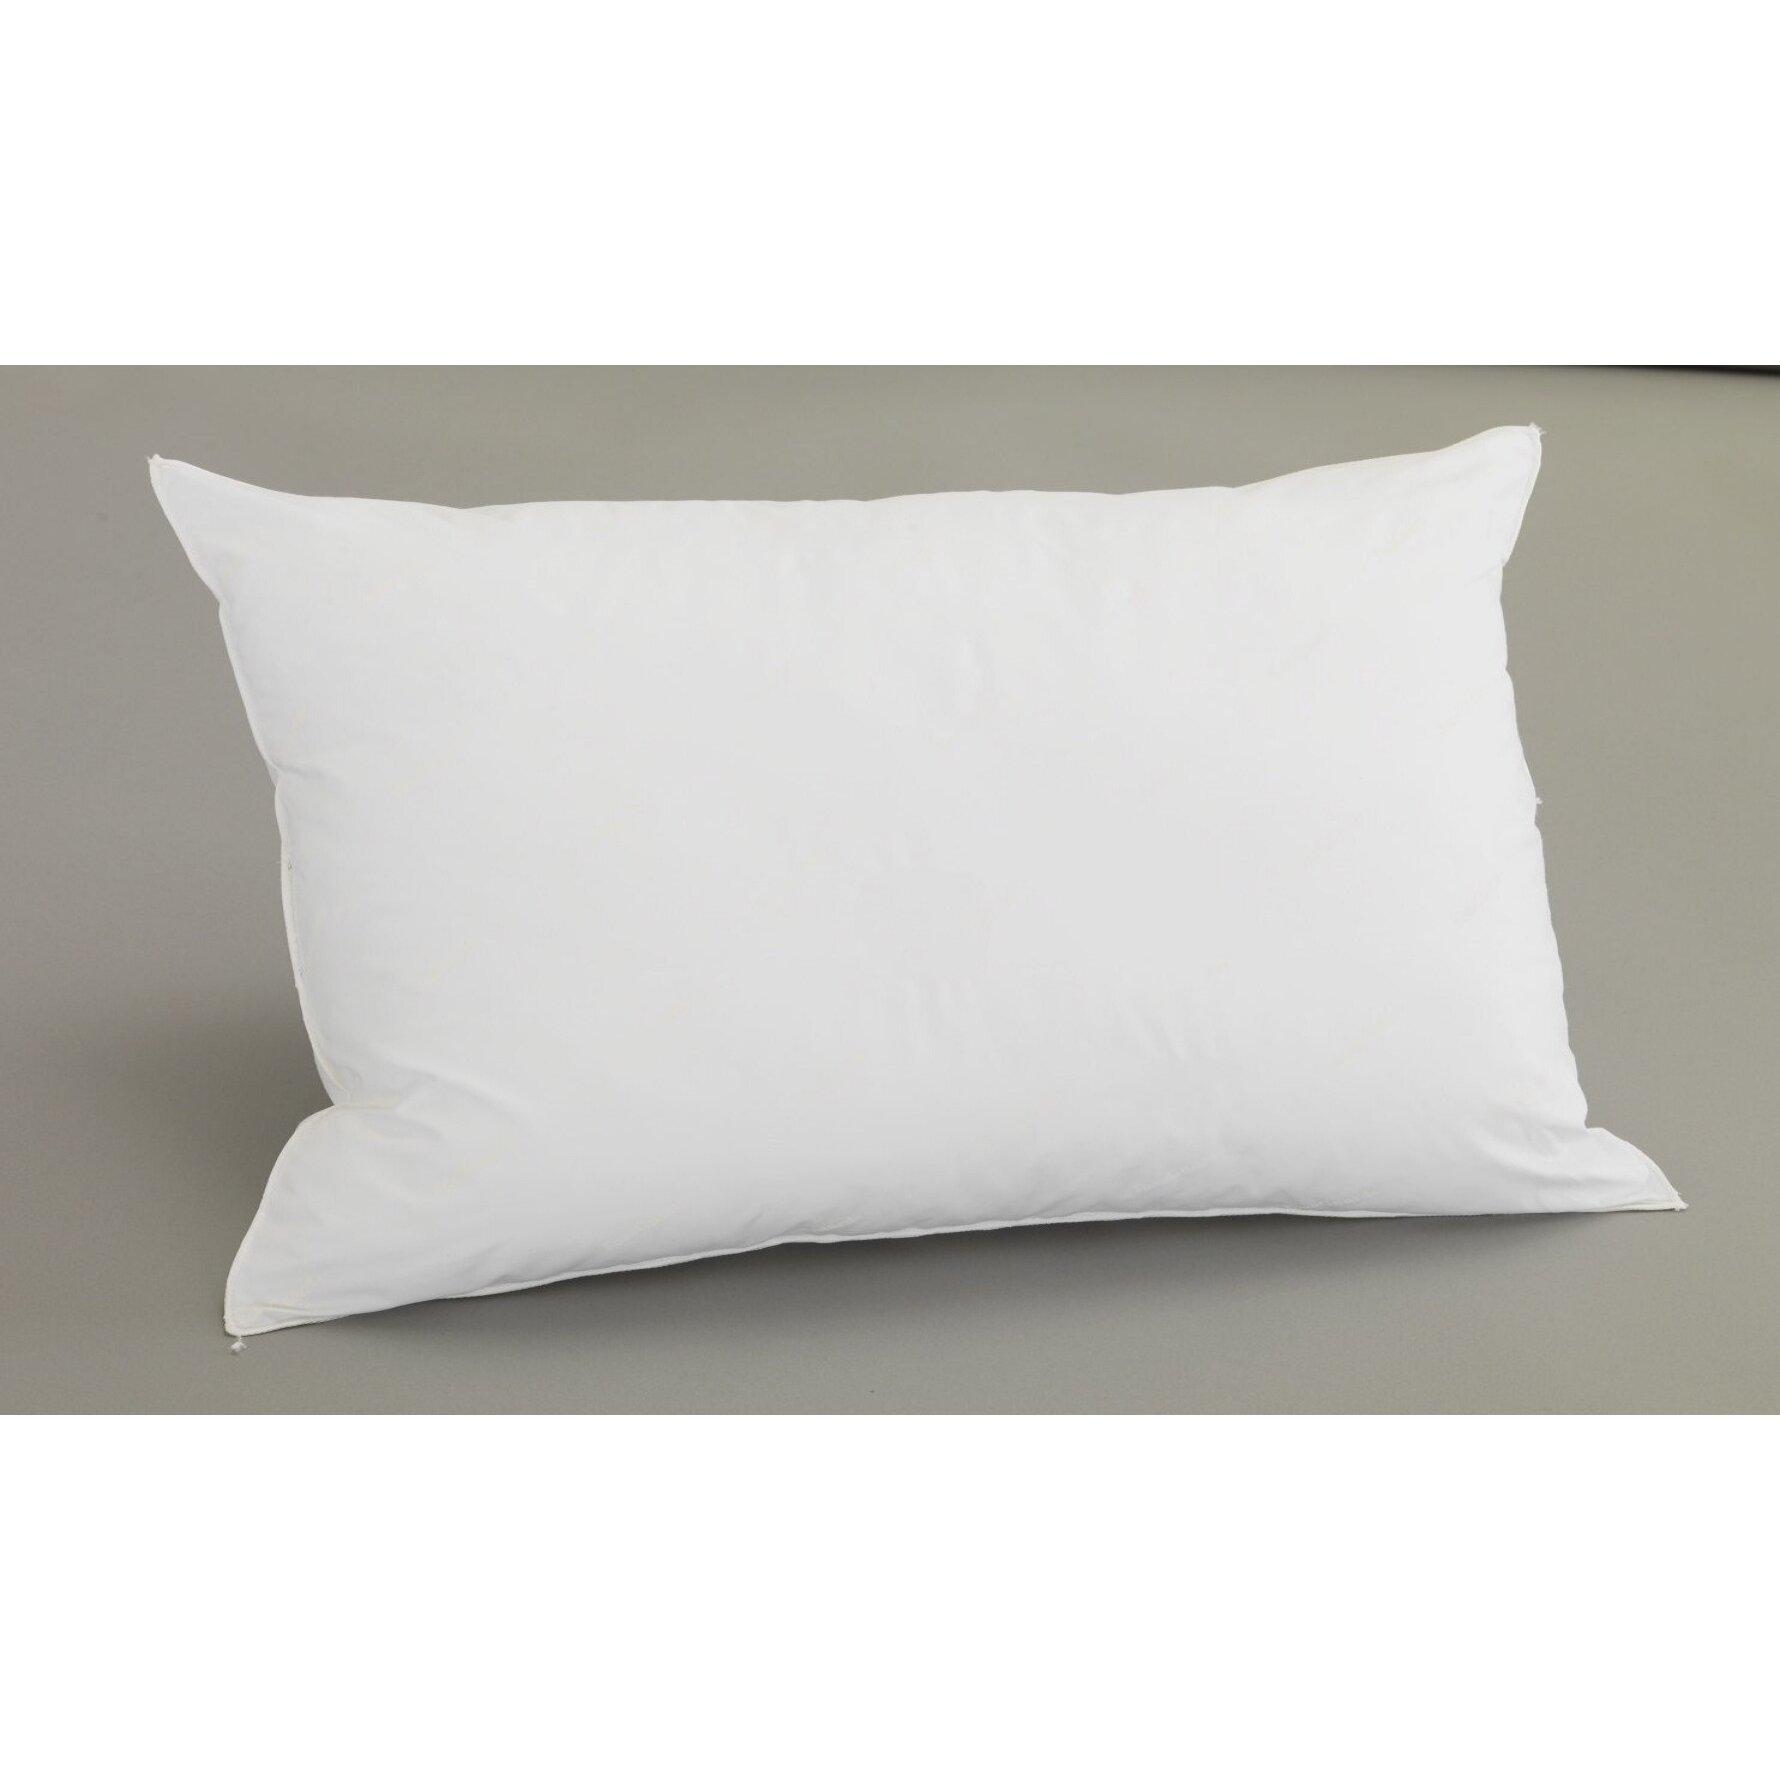 Moonlight slumber pure slumber bed pillow reviews wayfair for Bed pillows reviews